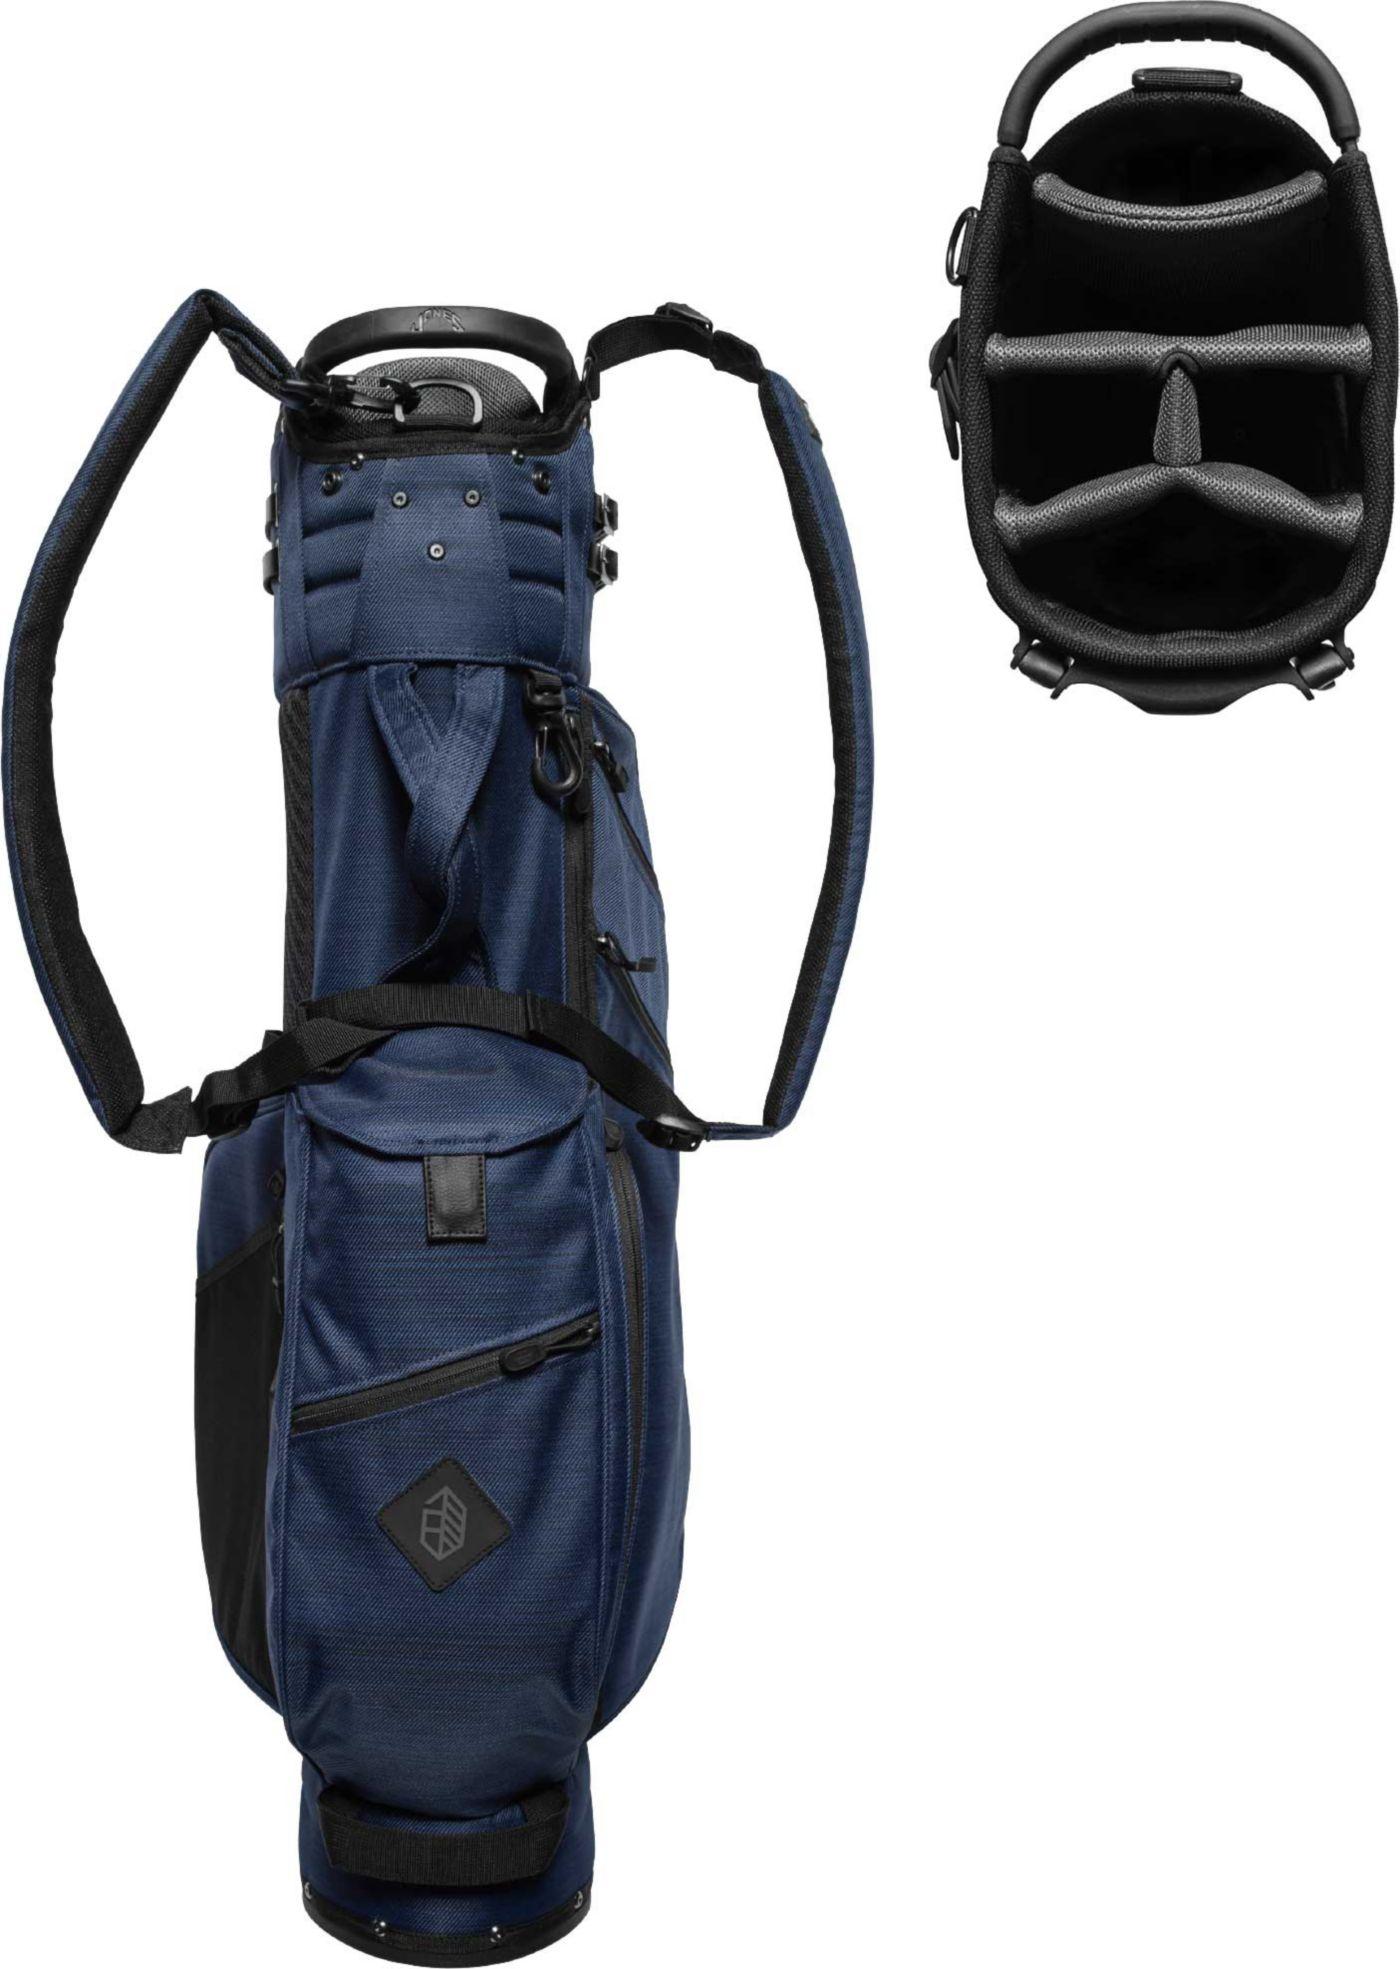 Jones Utility Trouper Stand Golf Bag